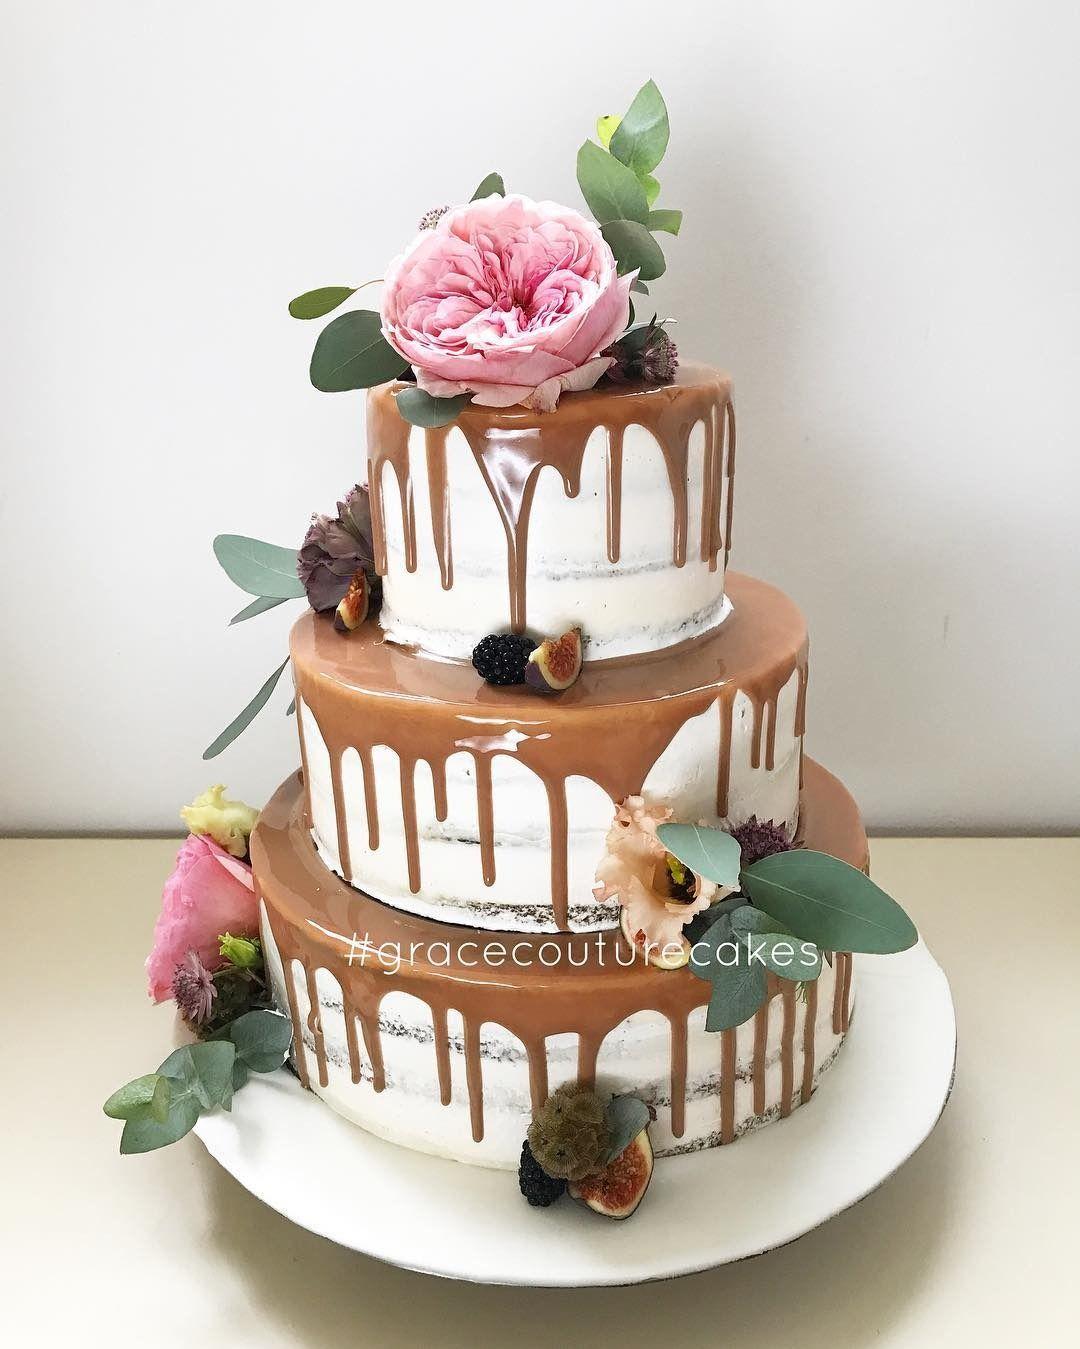 Drip Wedding Cakes: 42 Unique Cake Ideas For Your Wedding